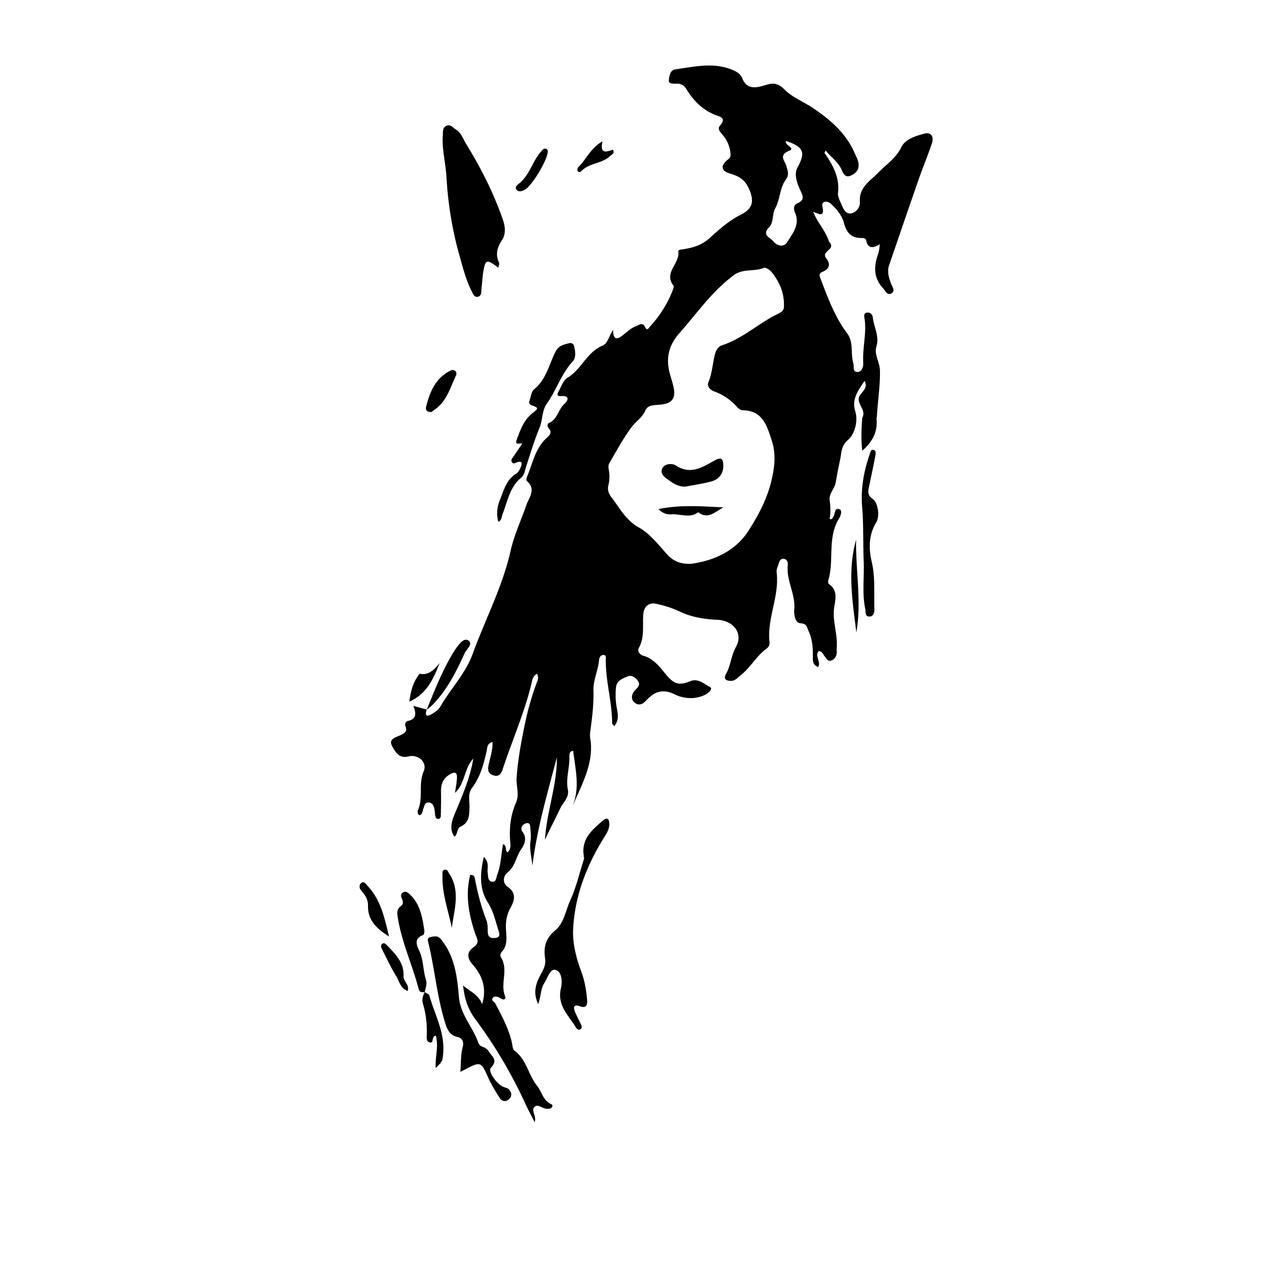 ellannan_vlos_xar_zith___silhouette_by_lmef2009-d9v047s.jpg